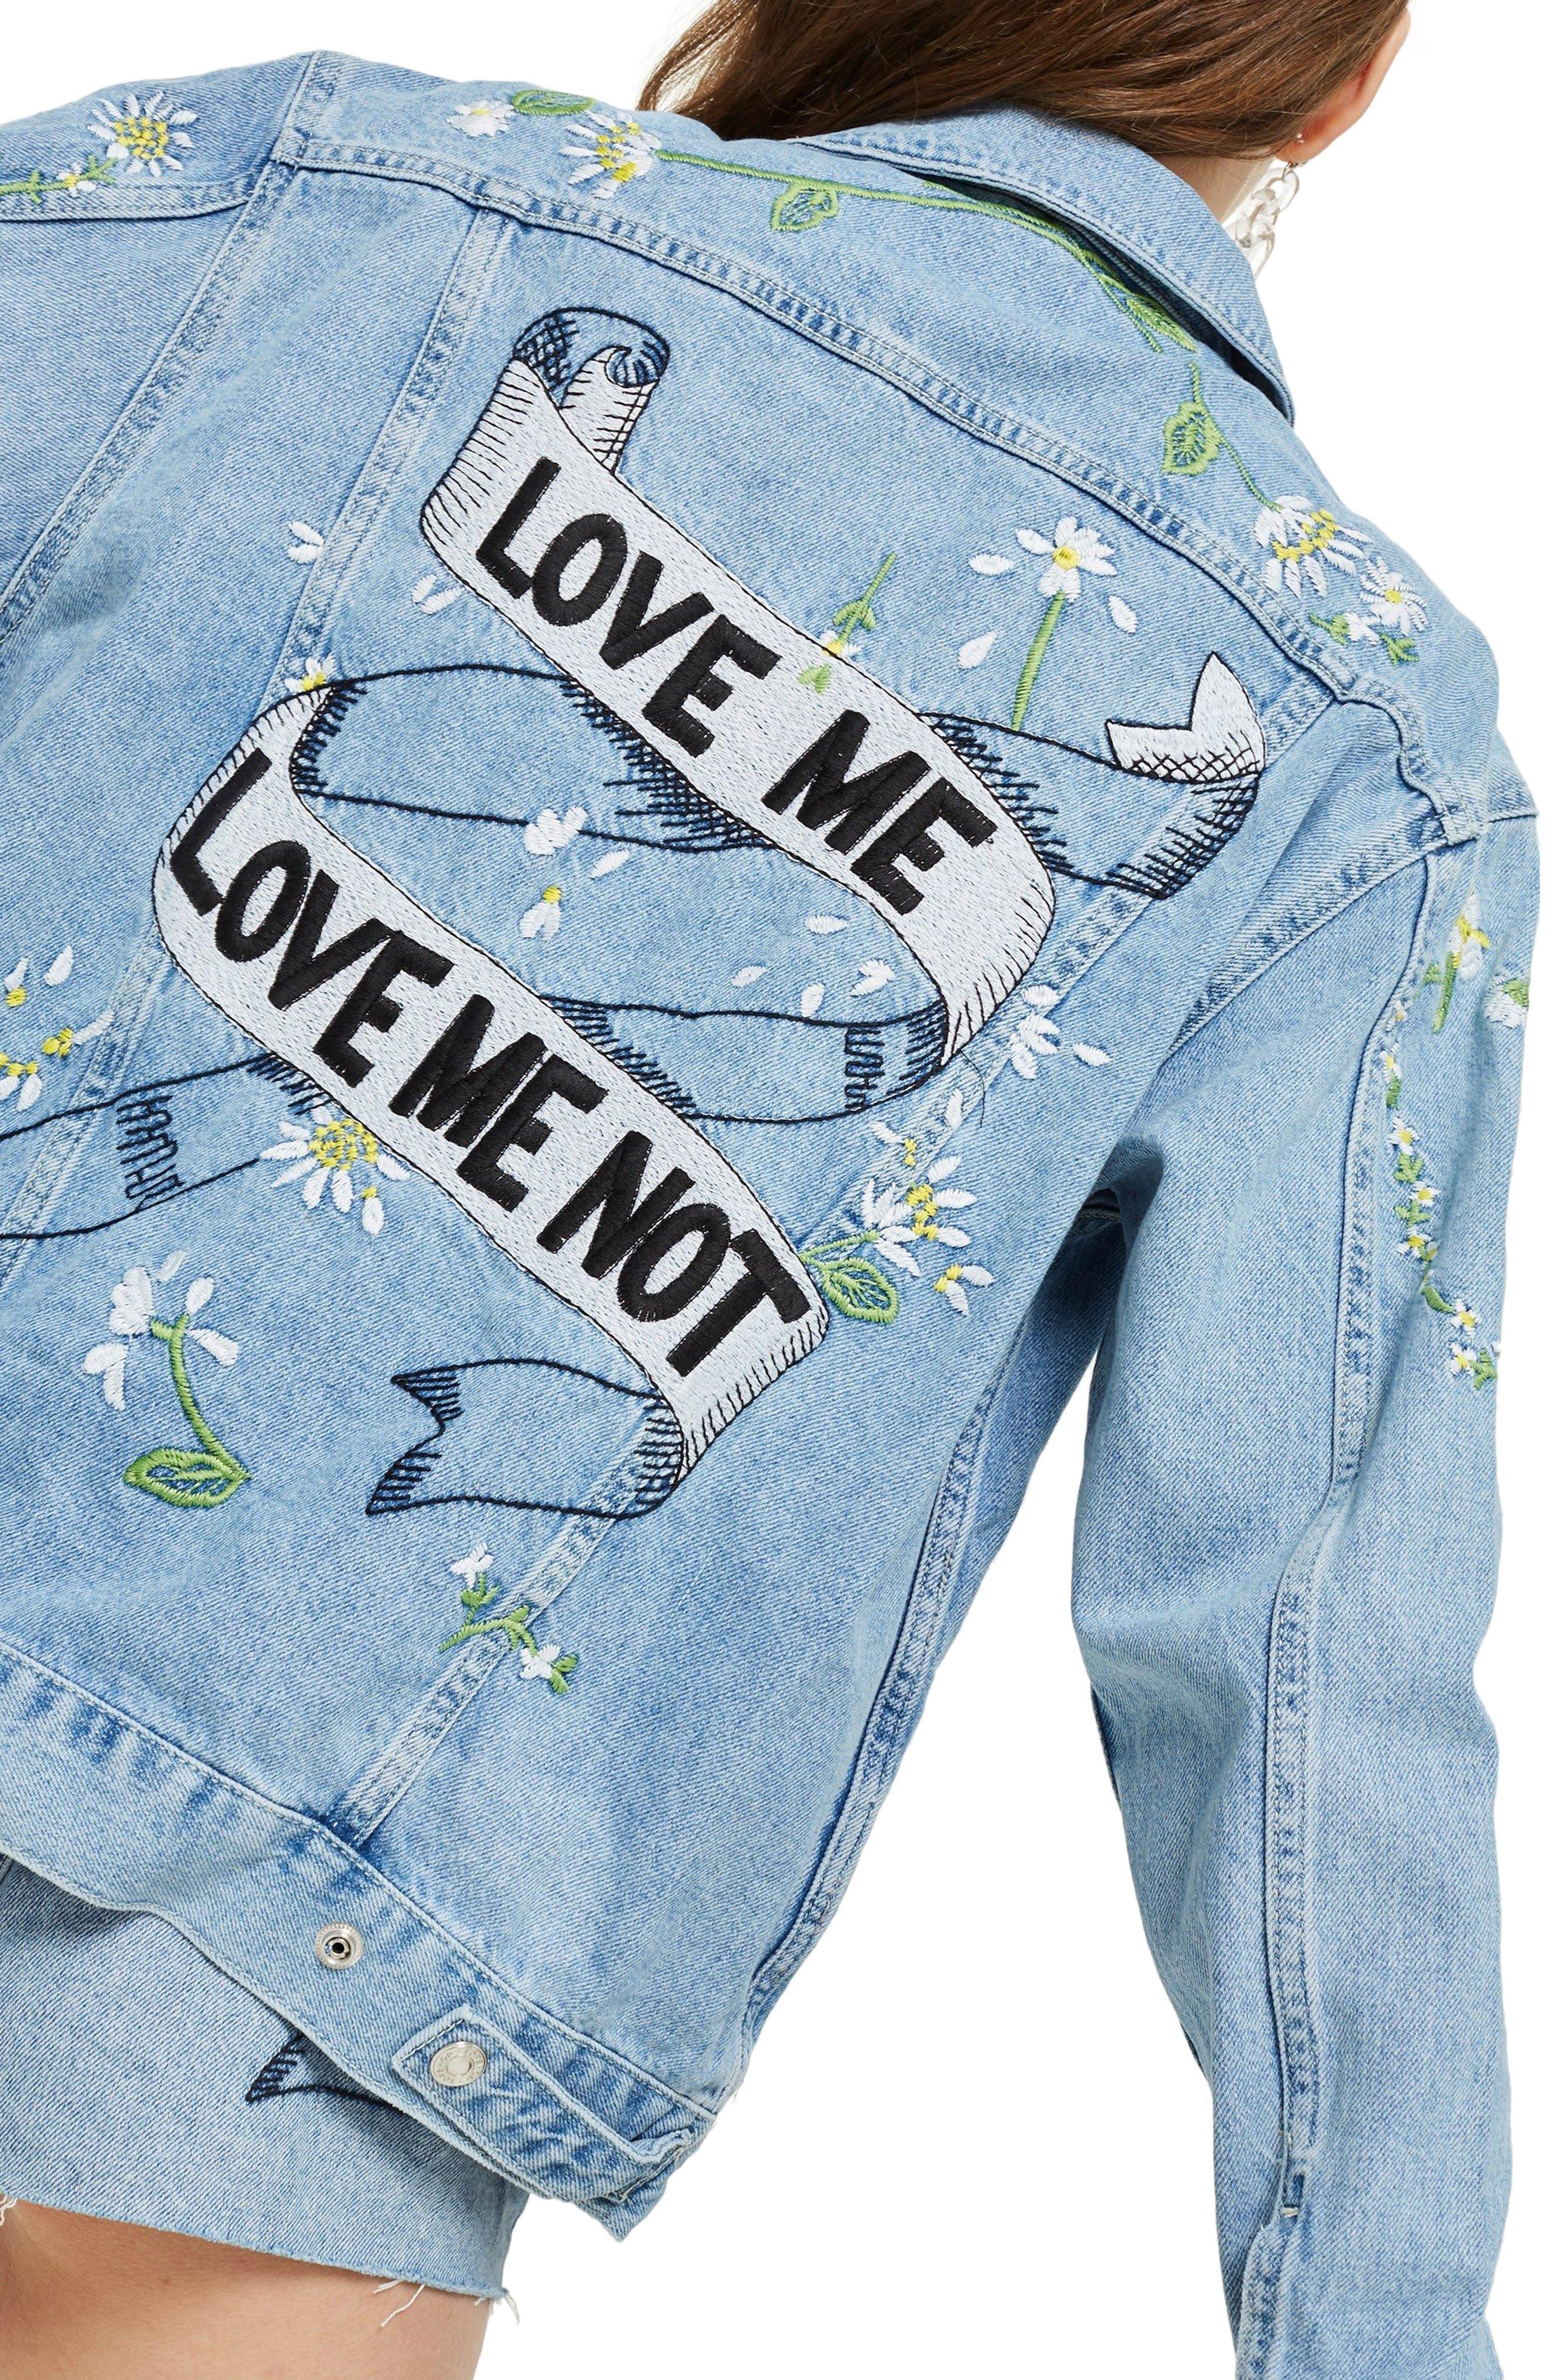 Love Me Not Embroidered Denim Jacket,                             Alternate thumbnail 2, color,